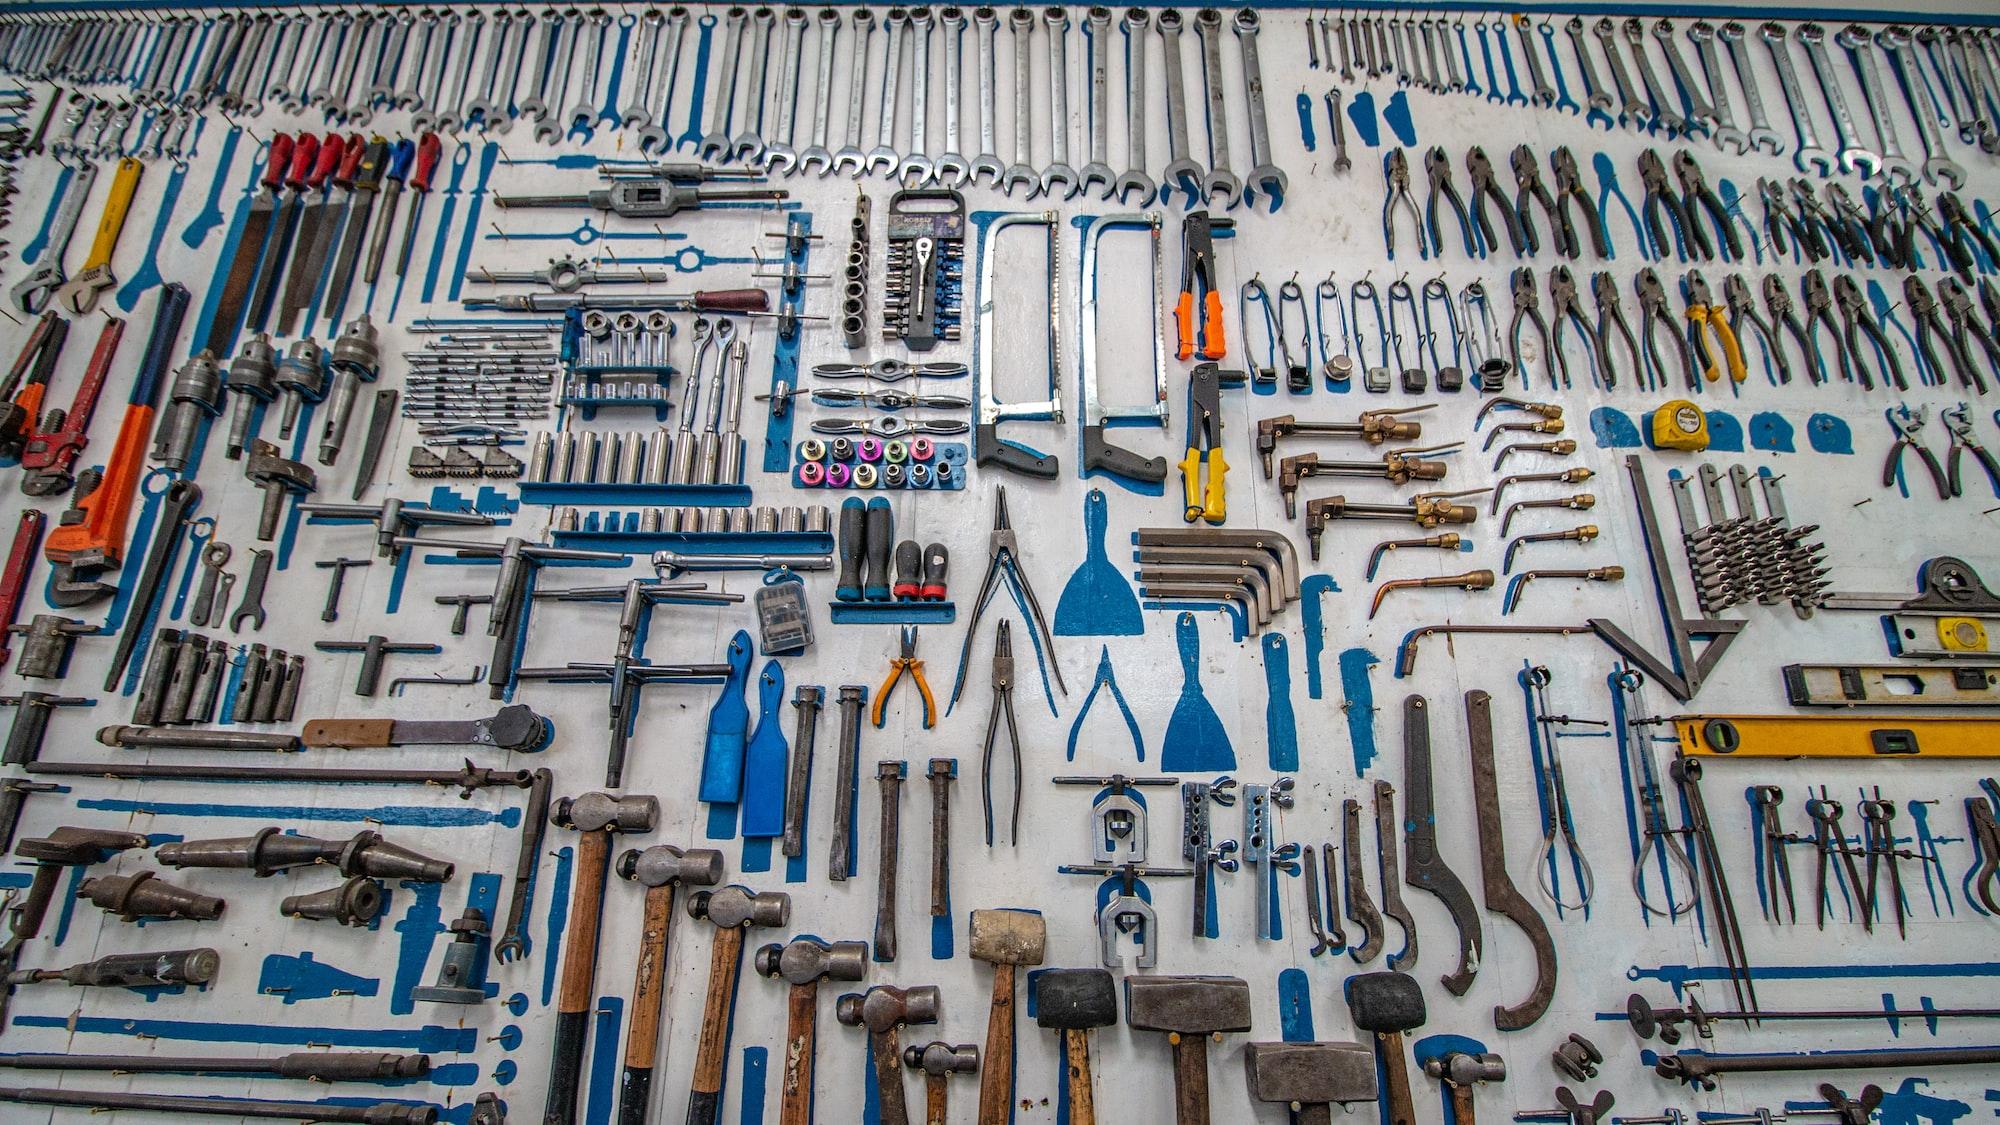 Dyalog Tooling Resources List (LambdaConf Talk 2020)